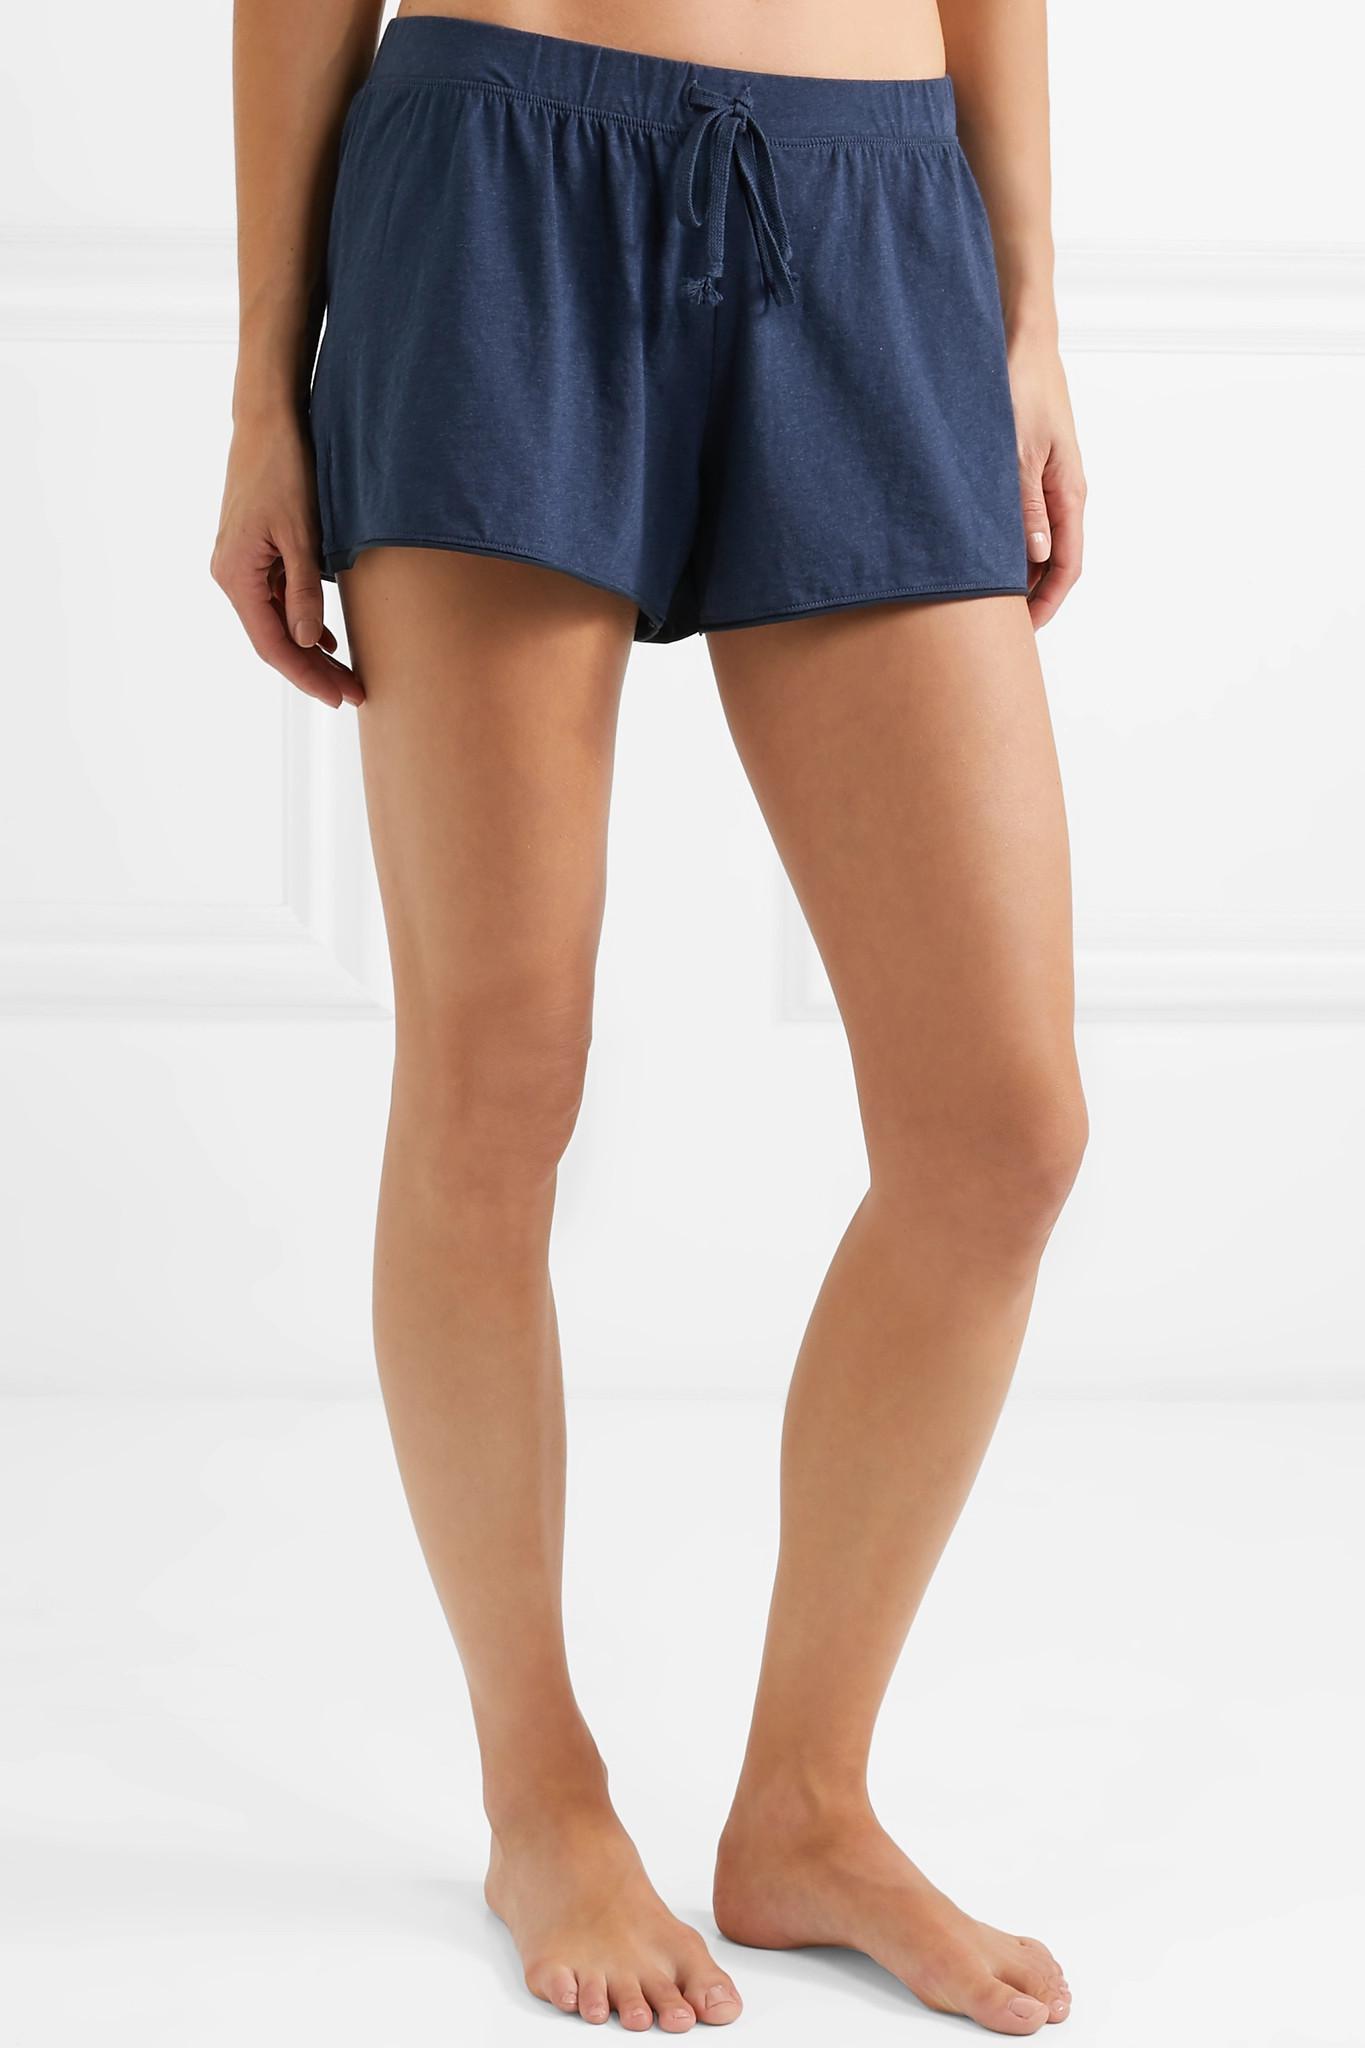 Sleepwear & Robes Bnwt Indigo Sky Cute Satin Summer Pyjama Sleeping Cat Design Gift Hanger 12-14 Yet Not Vulgar